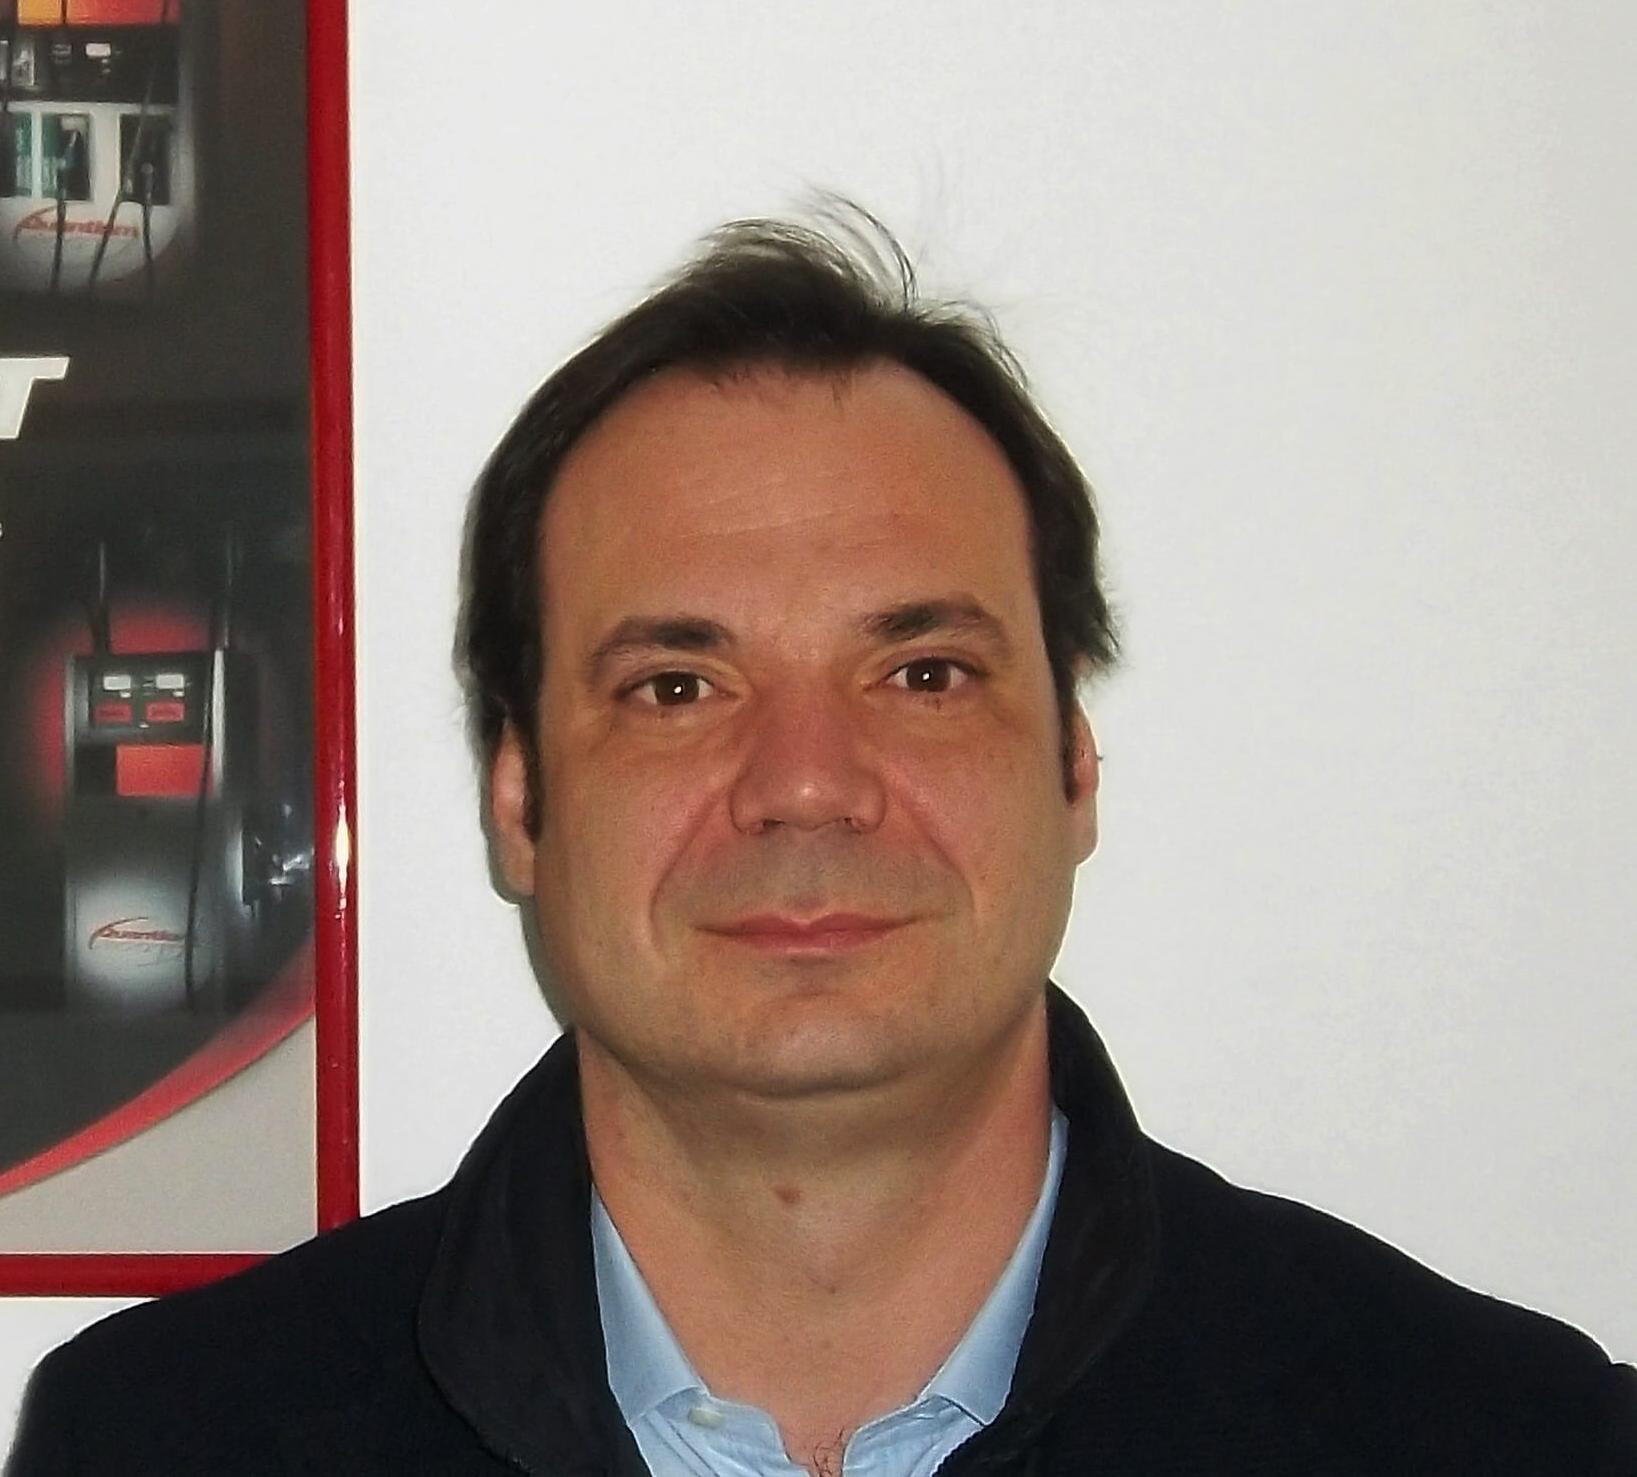 Fabiano Clerico